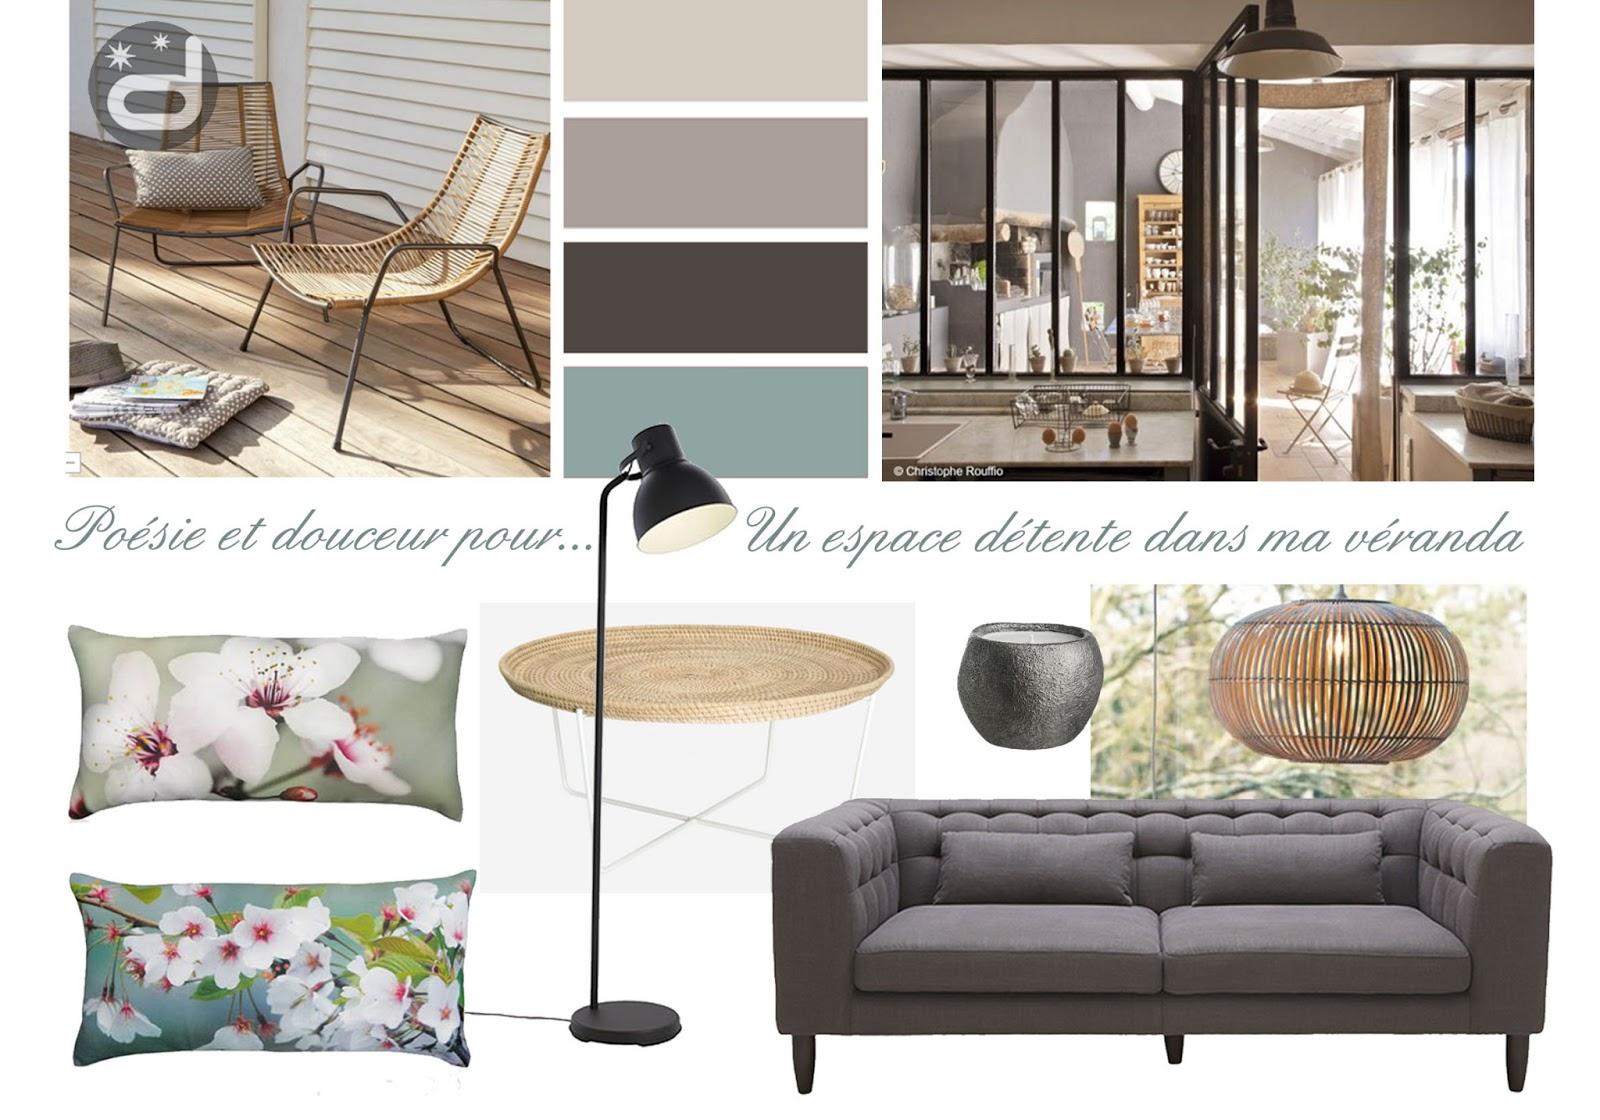 divin 39 id le blog d co planche d 39 ambiance pour un salon v randa a mood board for a. Black Bedroom Furniture Sets. Home Design Ideas